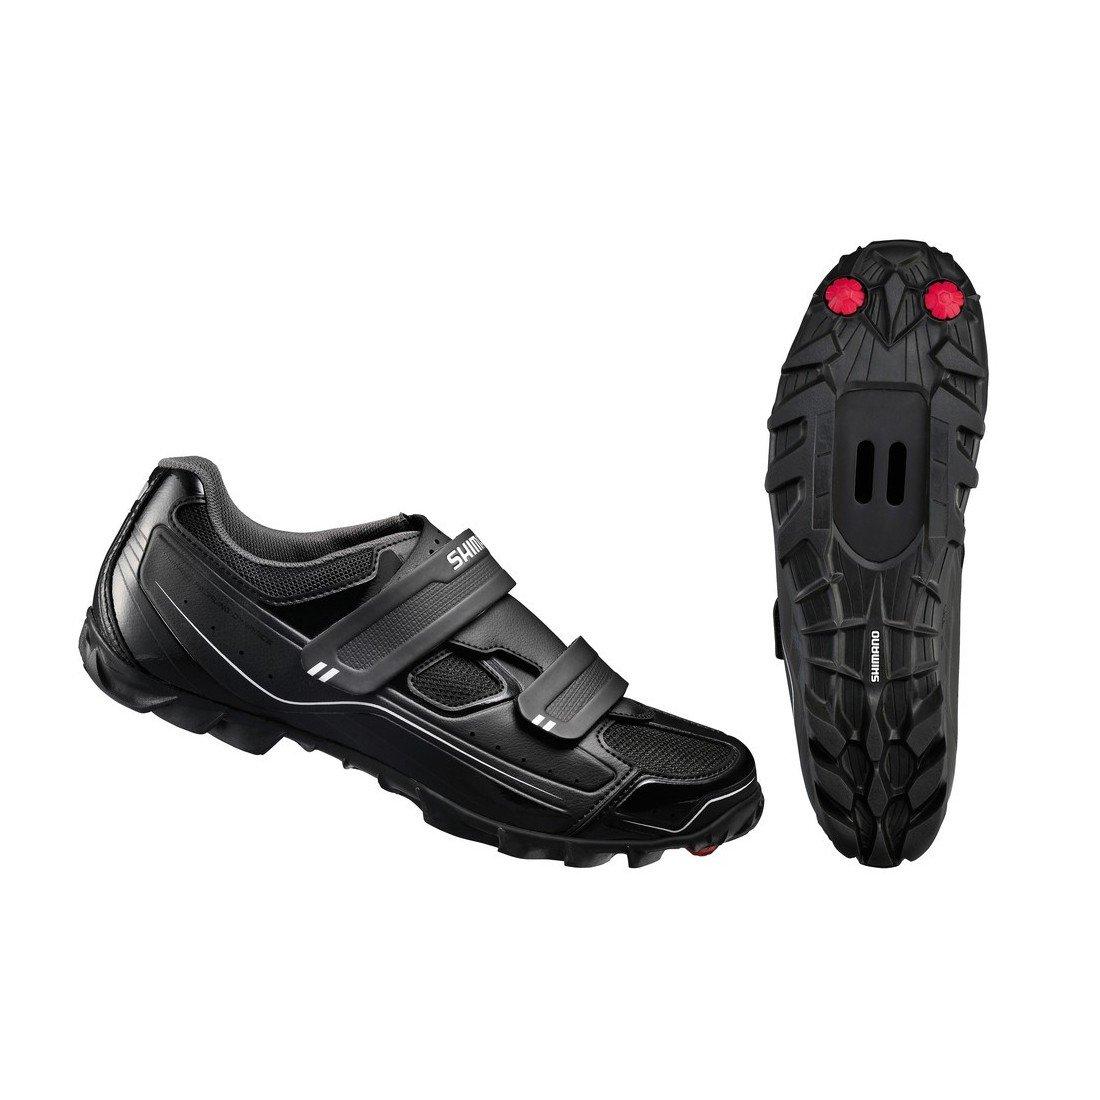 Shimano SH-M089L Schuhe Unisex schwarz 2017 Mountainbike-Schuhe Größe 47 4jTRIpZIH